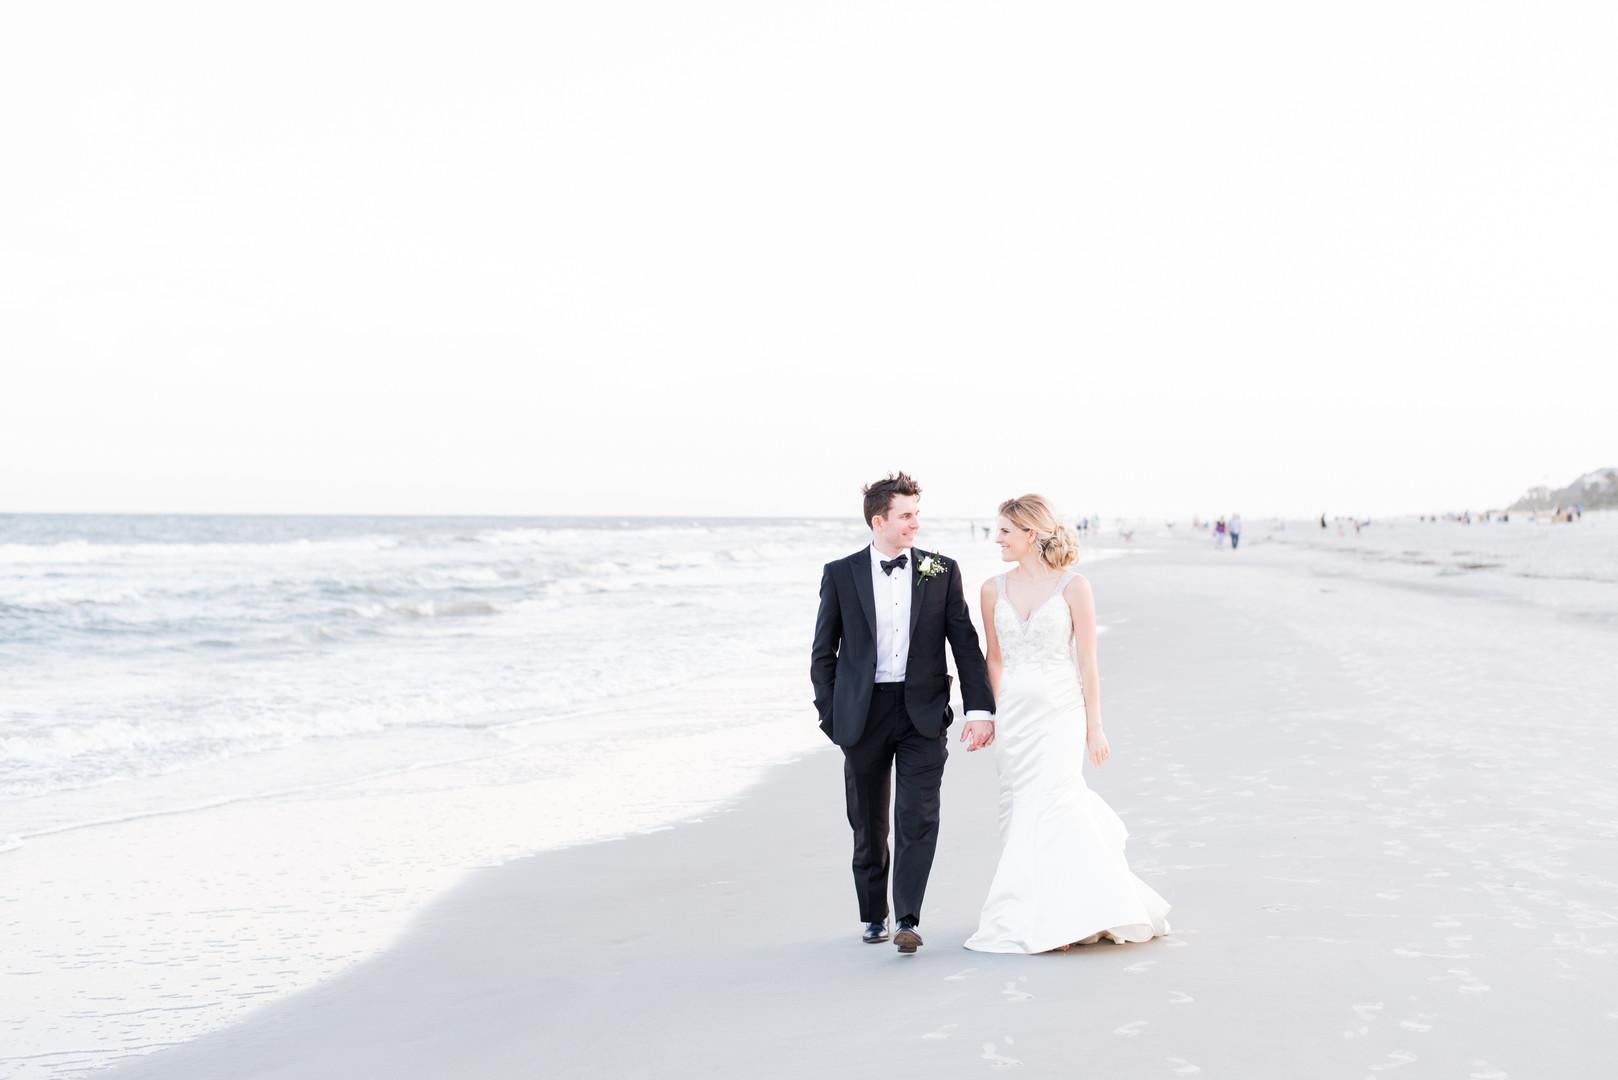 Jessica + Brian: Beach View Wedding at the Dunes House, Hilton Head Island   Palmetto State Weddings